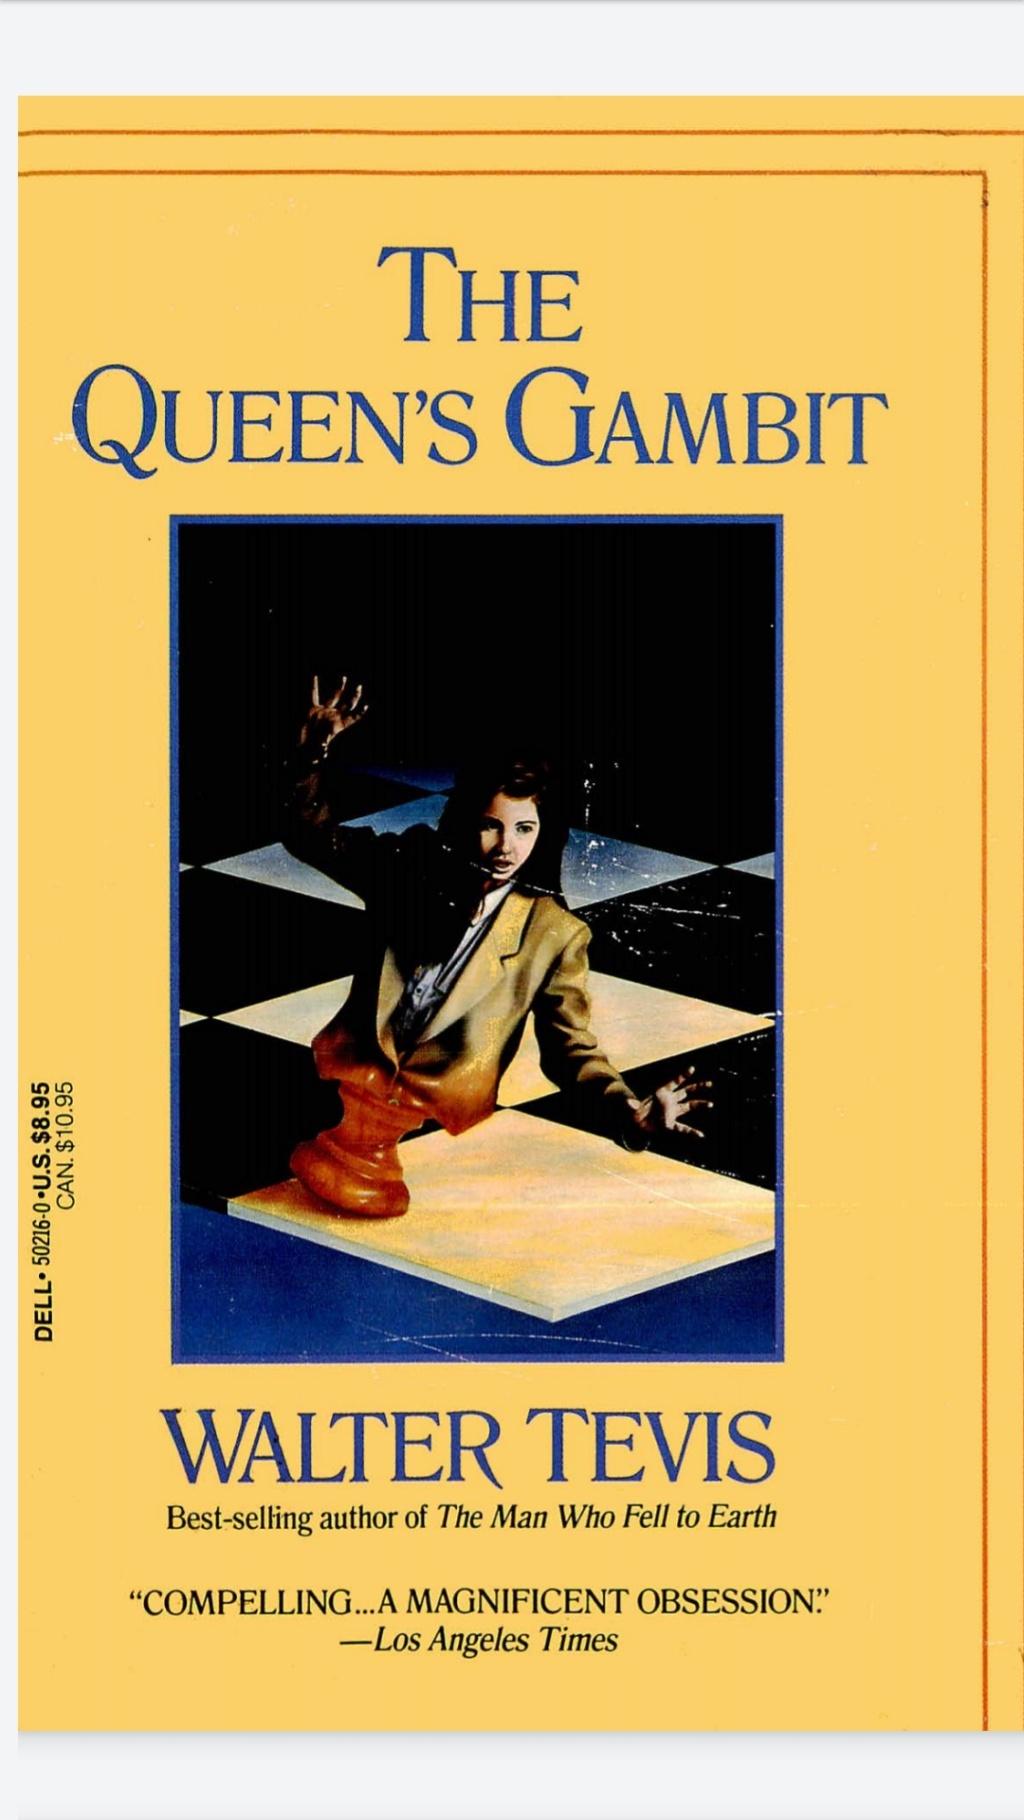 The Queen's Gambit: A Novel  (Vintage Contemporaries)  book  Screen67